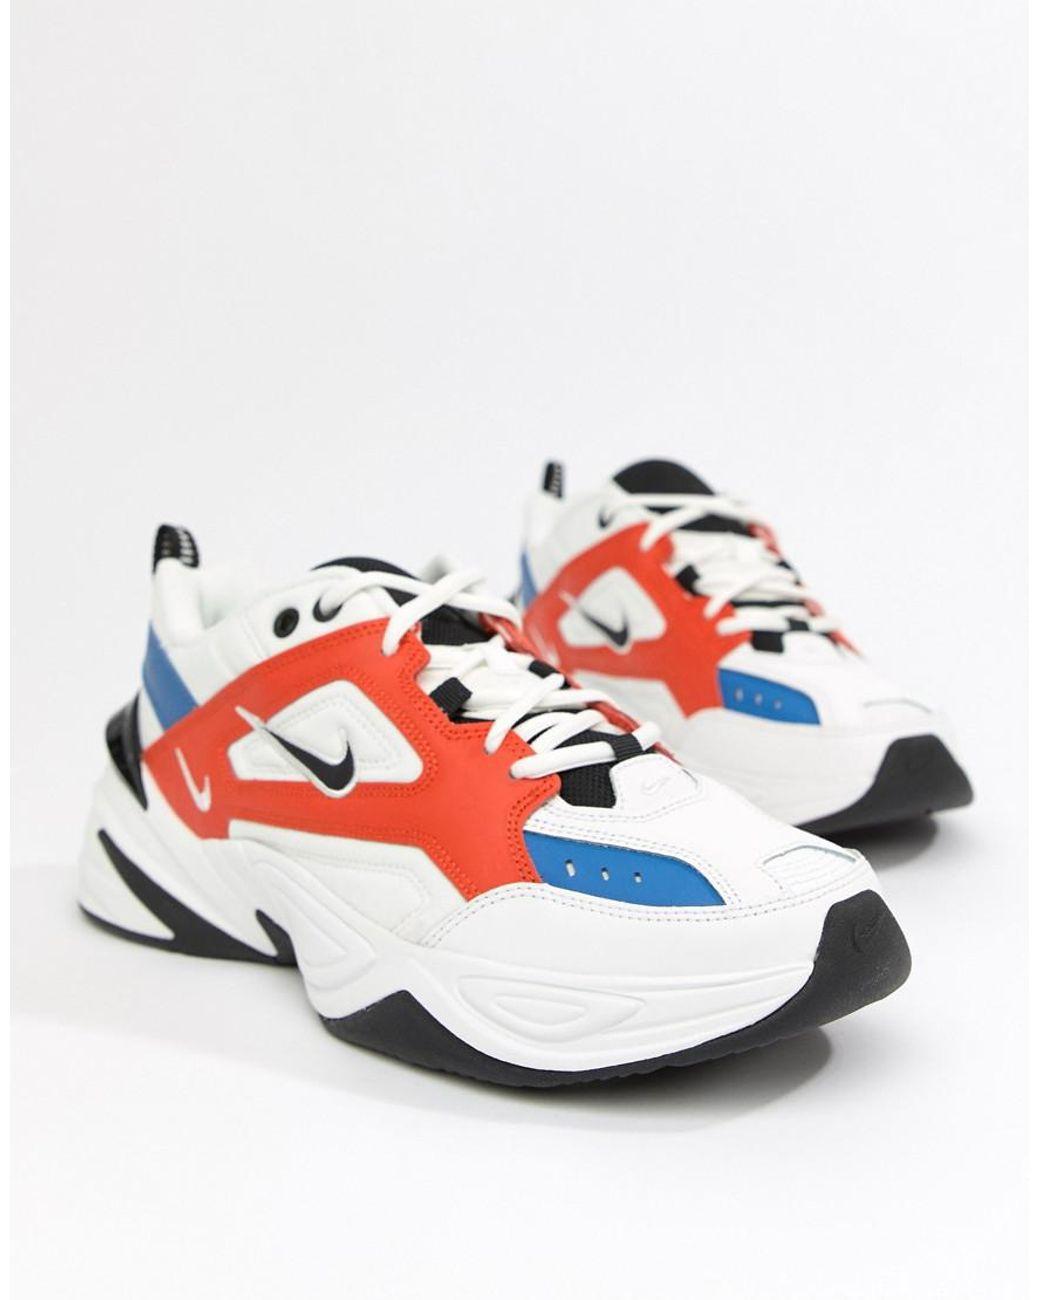 promo code ec7f4 2fddf Nike M2k Tekno Trainers In White Av4789-100 in White for Men - Lyst